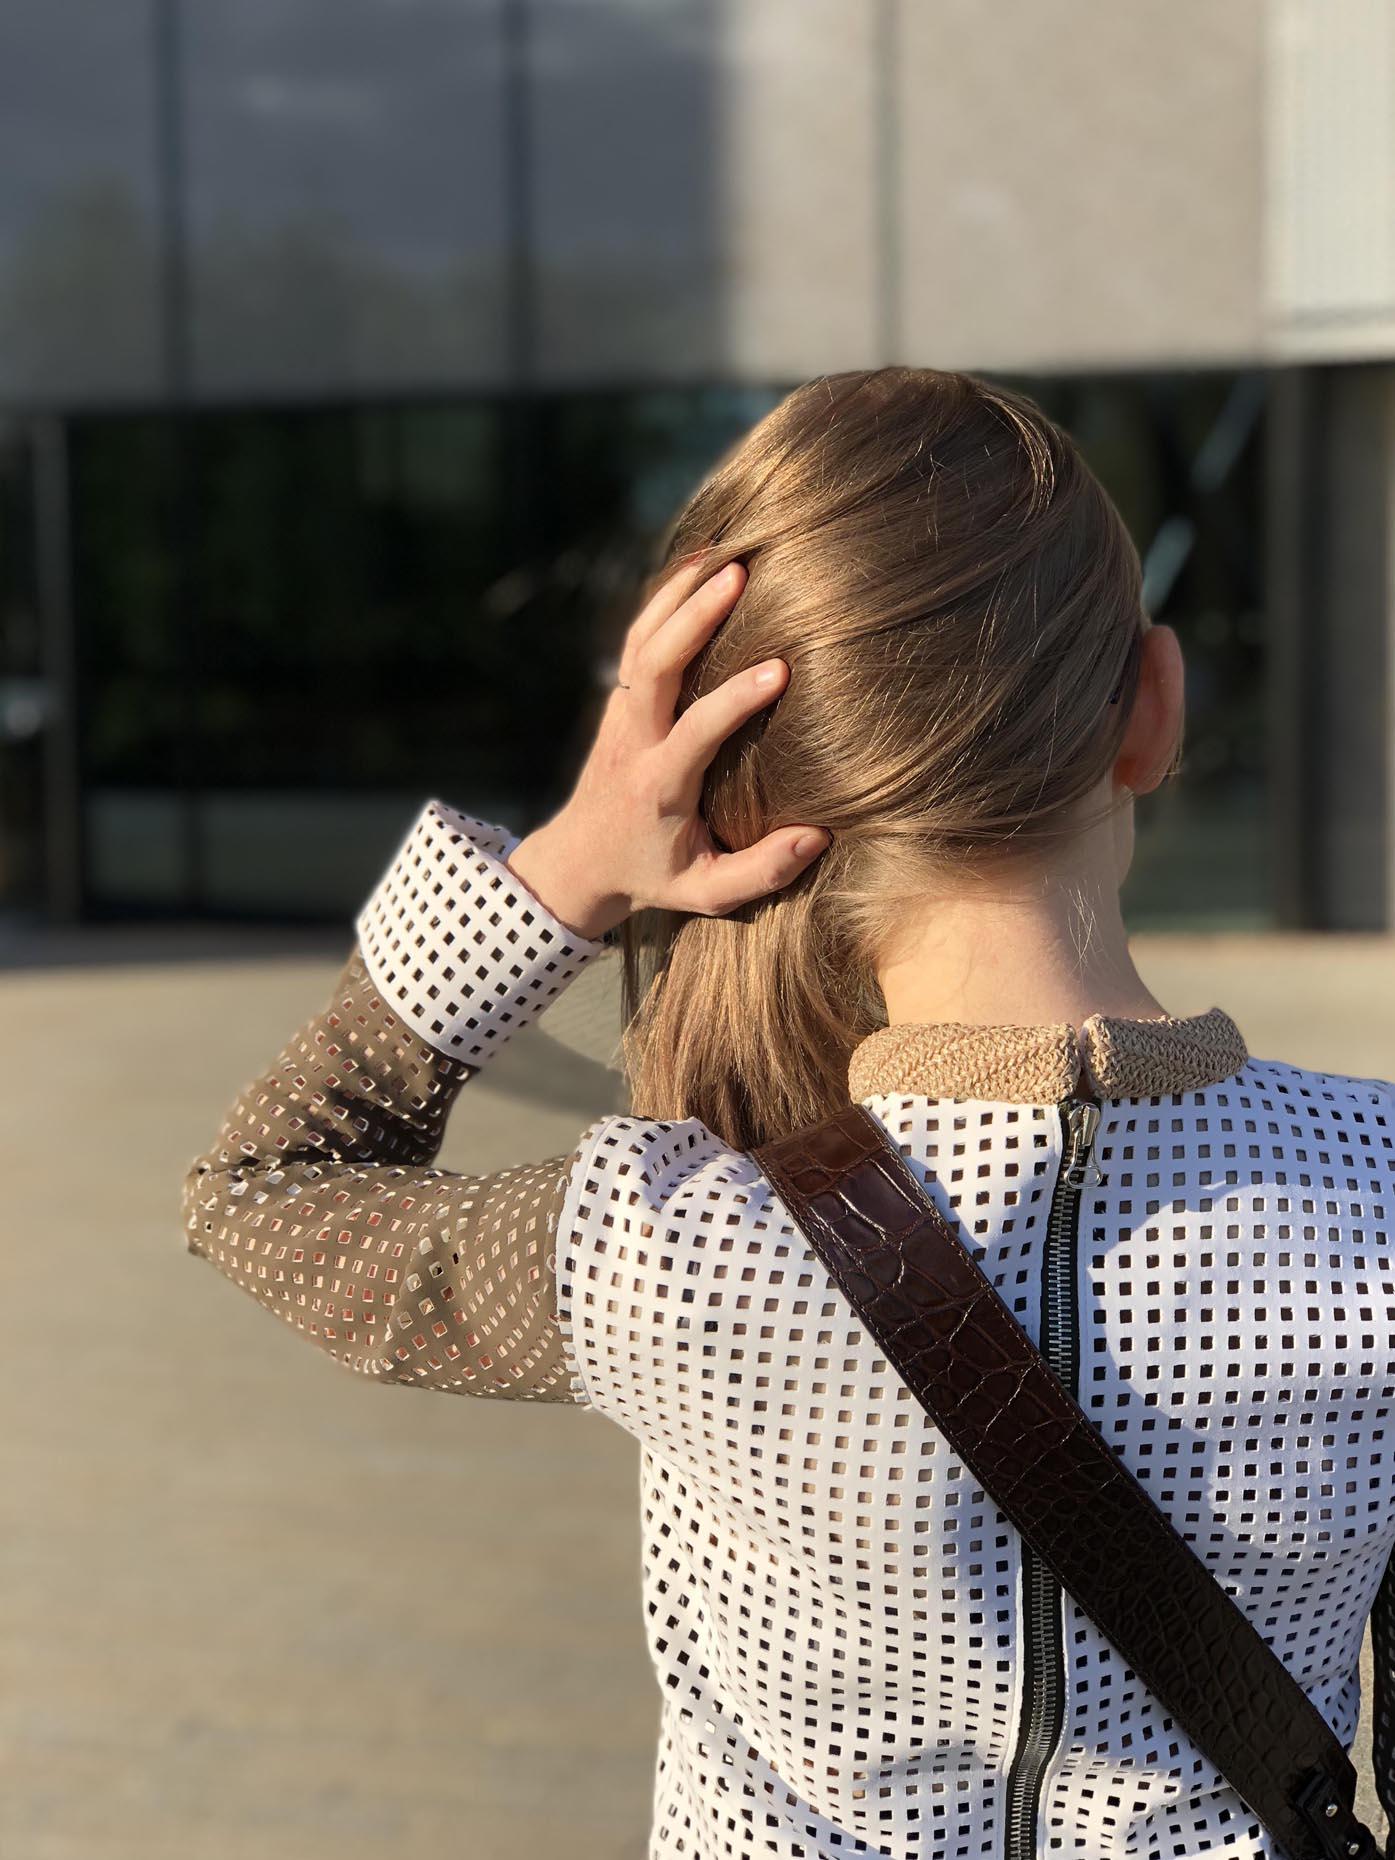 jw anderson top, saddle bag zofia chylak by Fashion Art Media